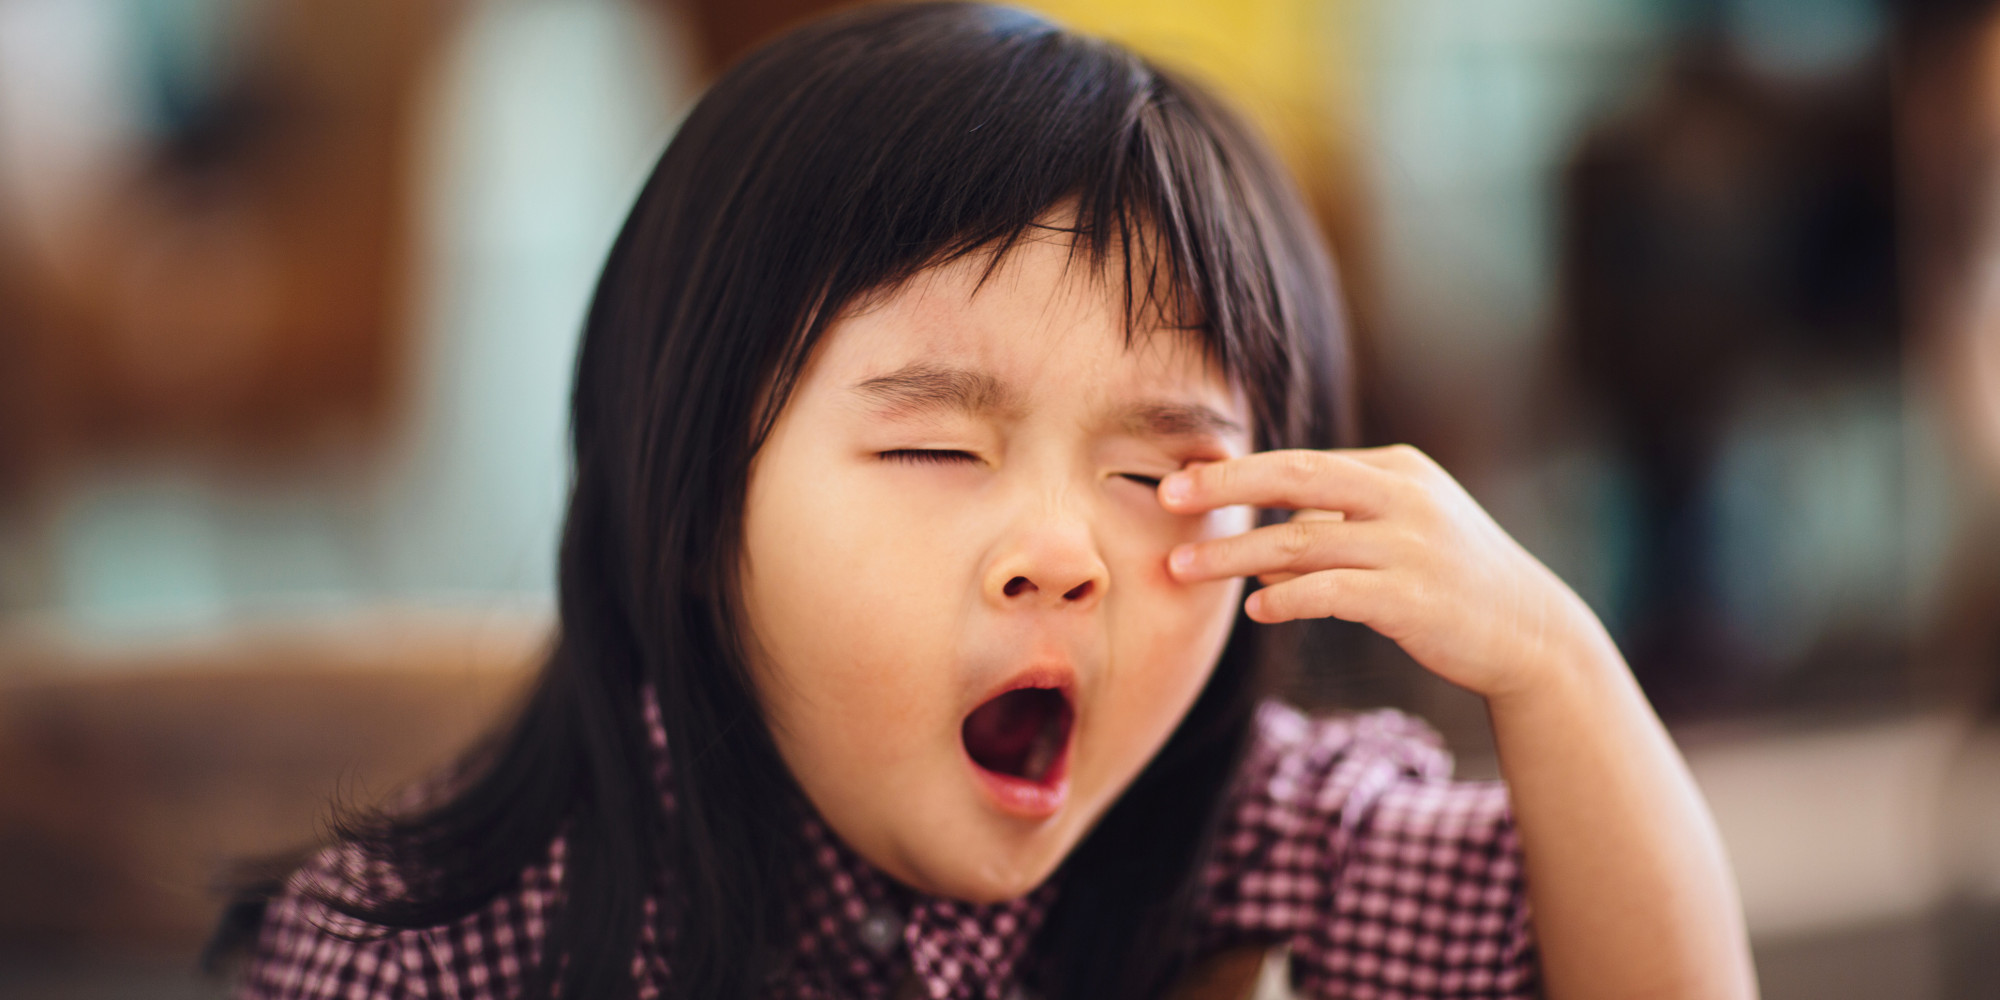 Contagious Yawning Dec... Girl Yawn Clipart